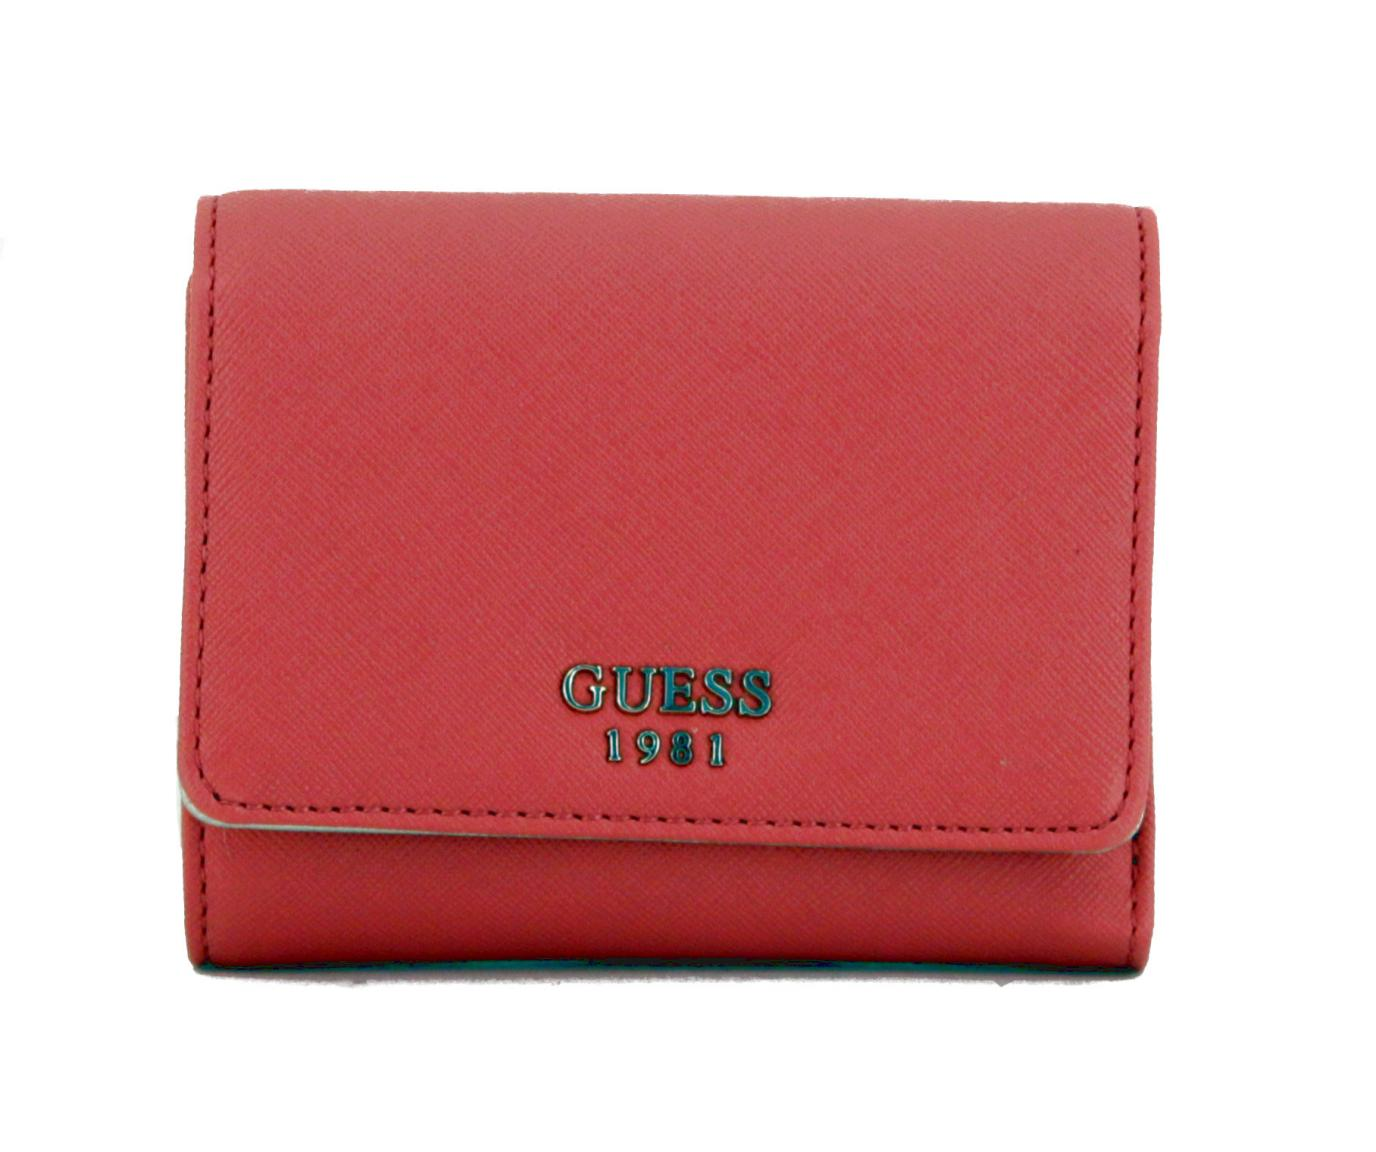 ac35e6ff1b6dd Guess Damenbörse Keaton Coral Pink gold - Bags   more